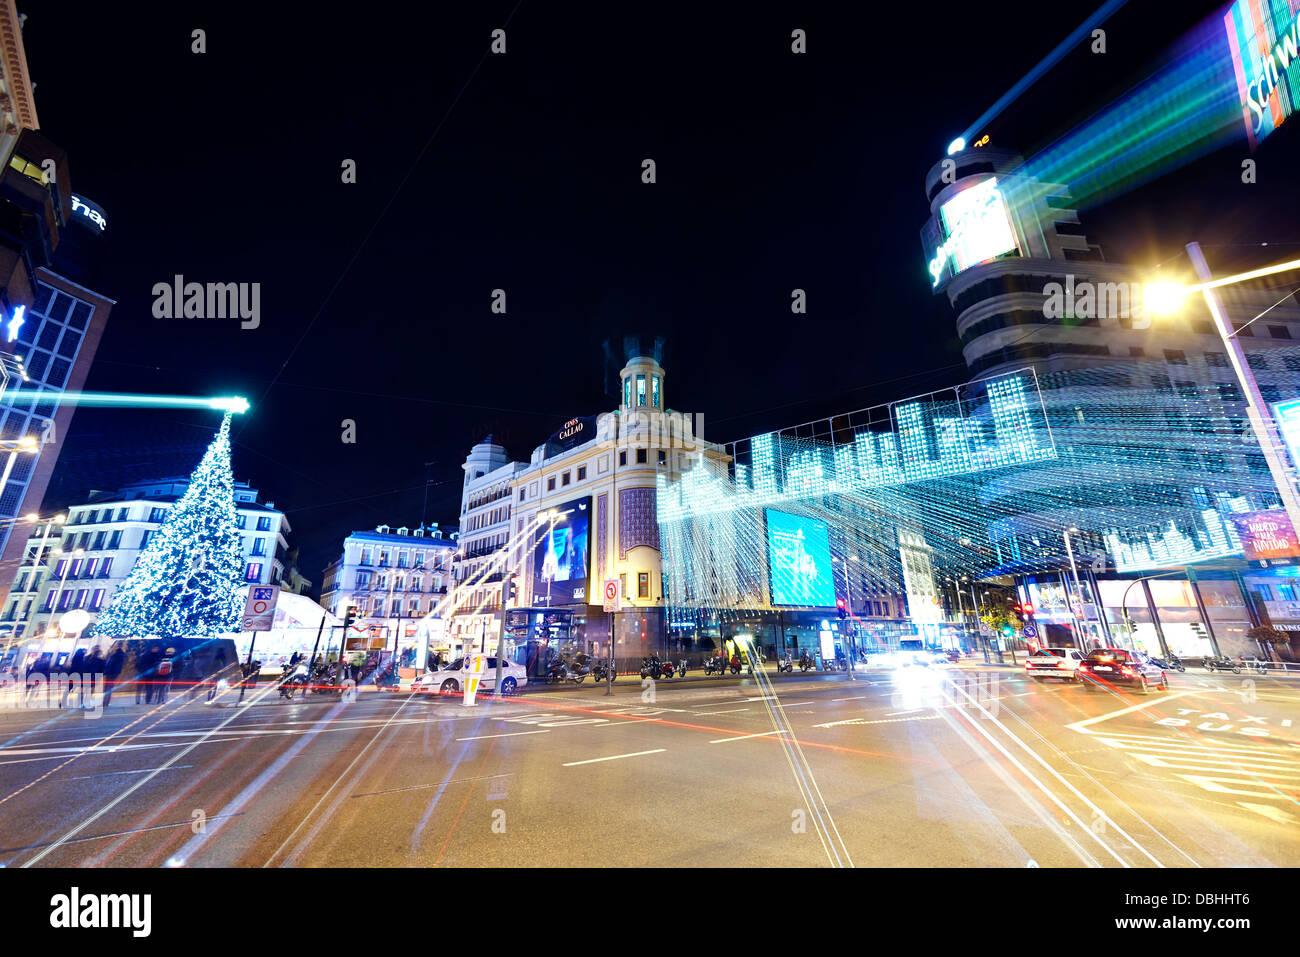 Le trafic à Callao Square avec string lights au moment de Noël. Madrid. L'Espagne. Photo Stock